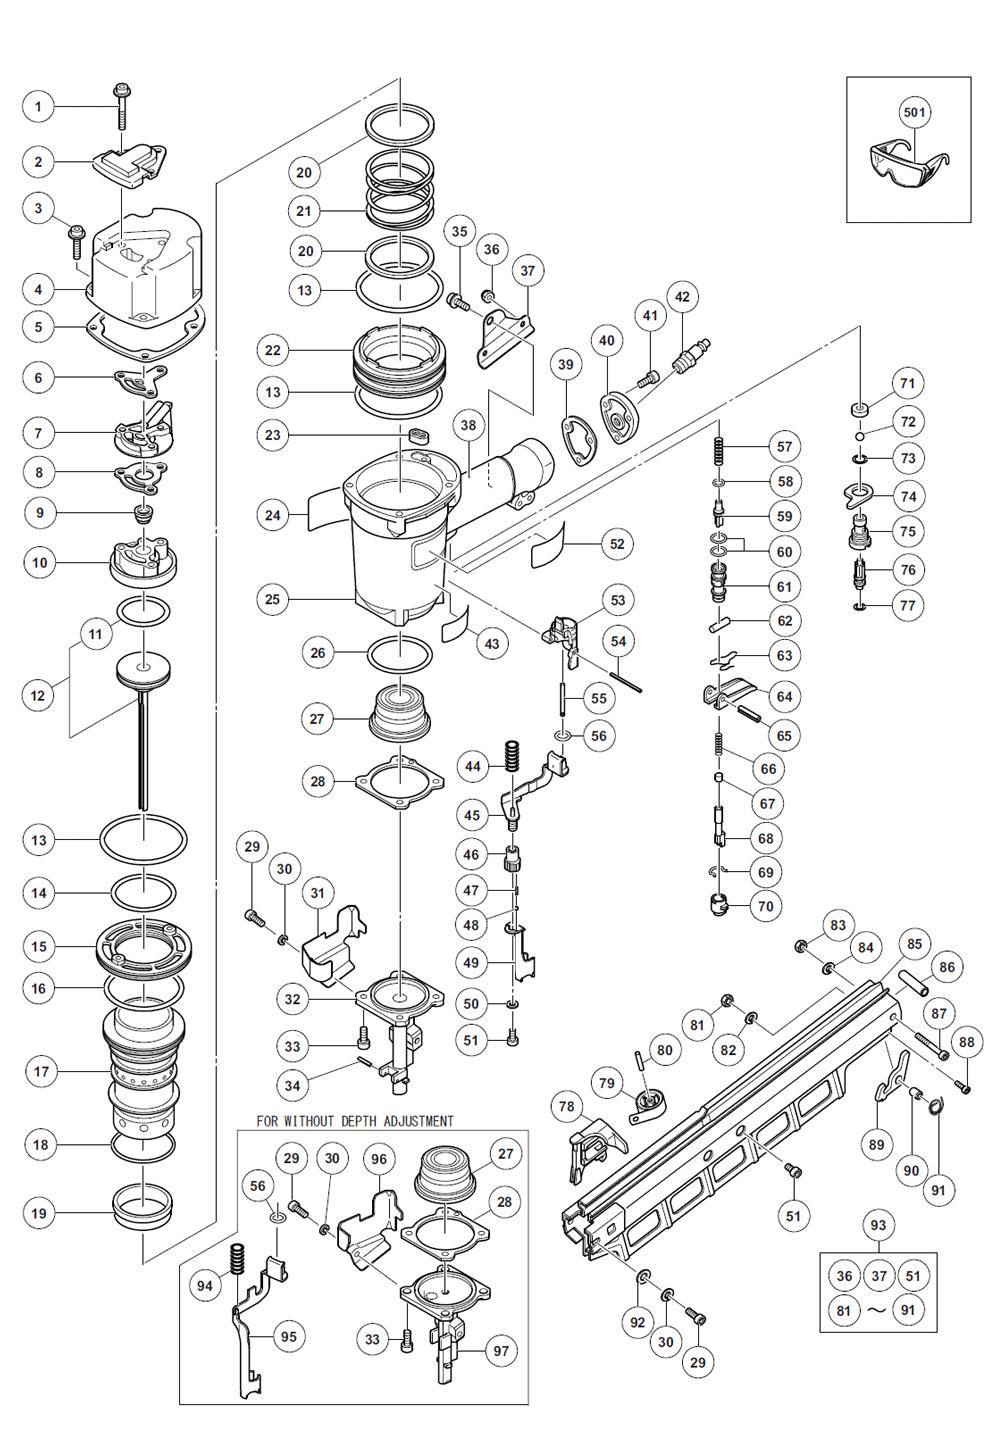 Buy Hitachi NR83A3(S) 3-1/4